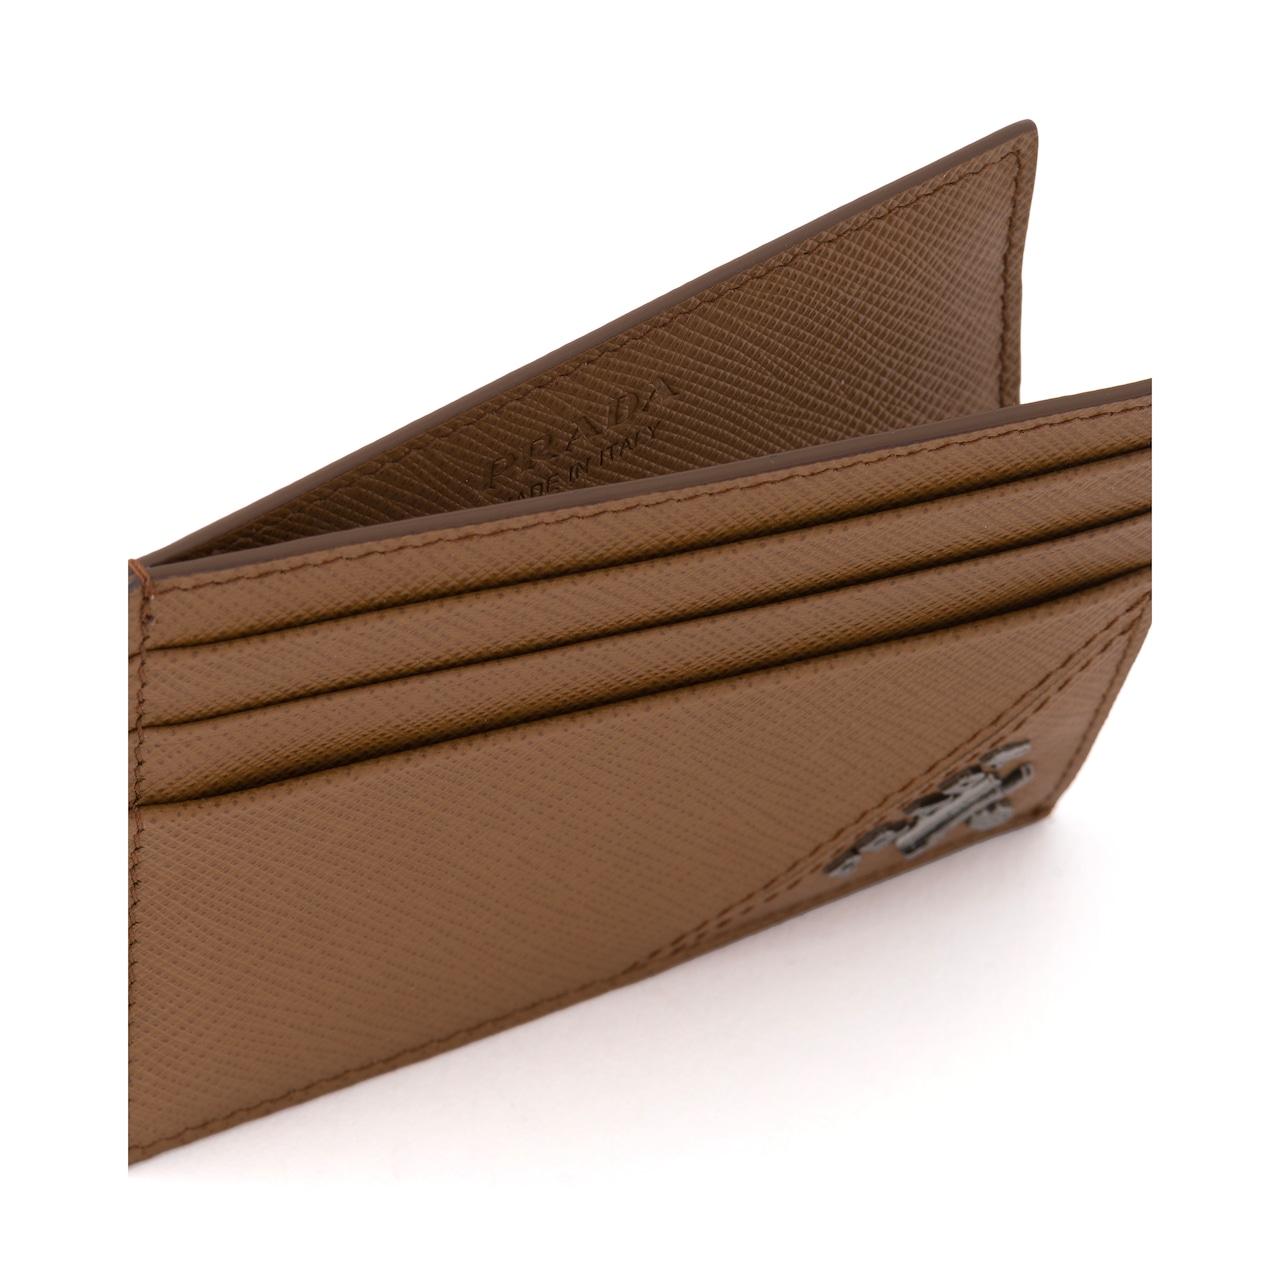 Prada 卡片夹 4